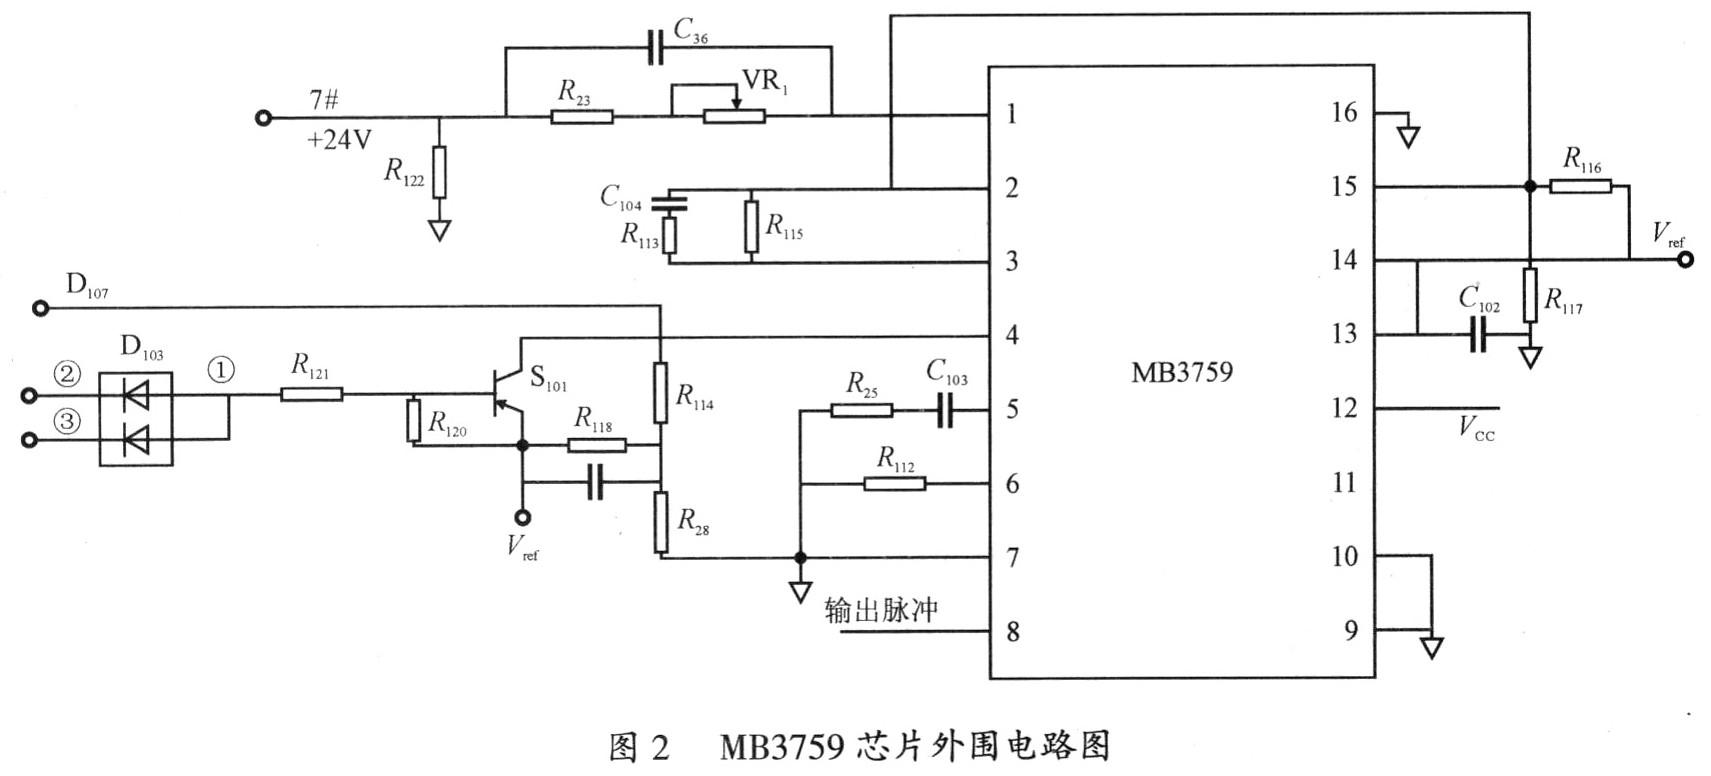 pwm比较器和锁存器及驱动电路组成.